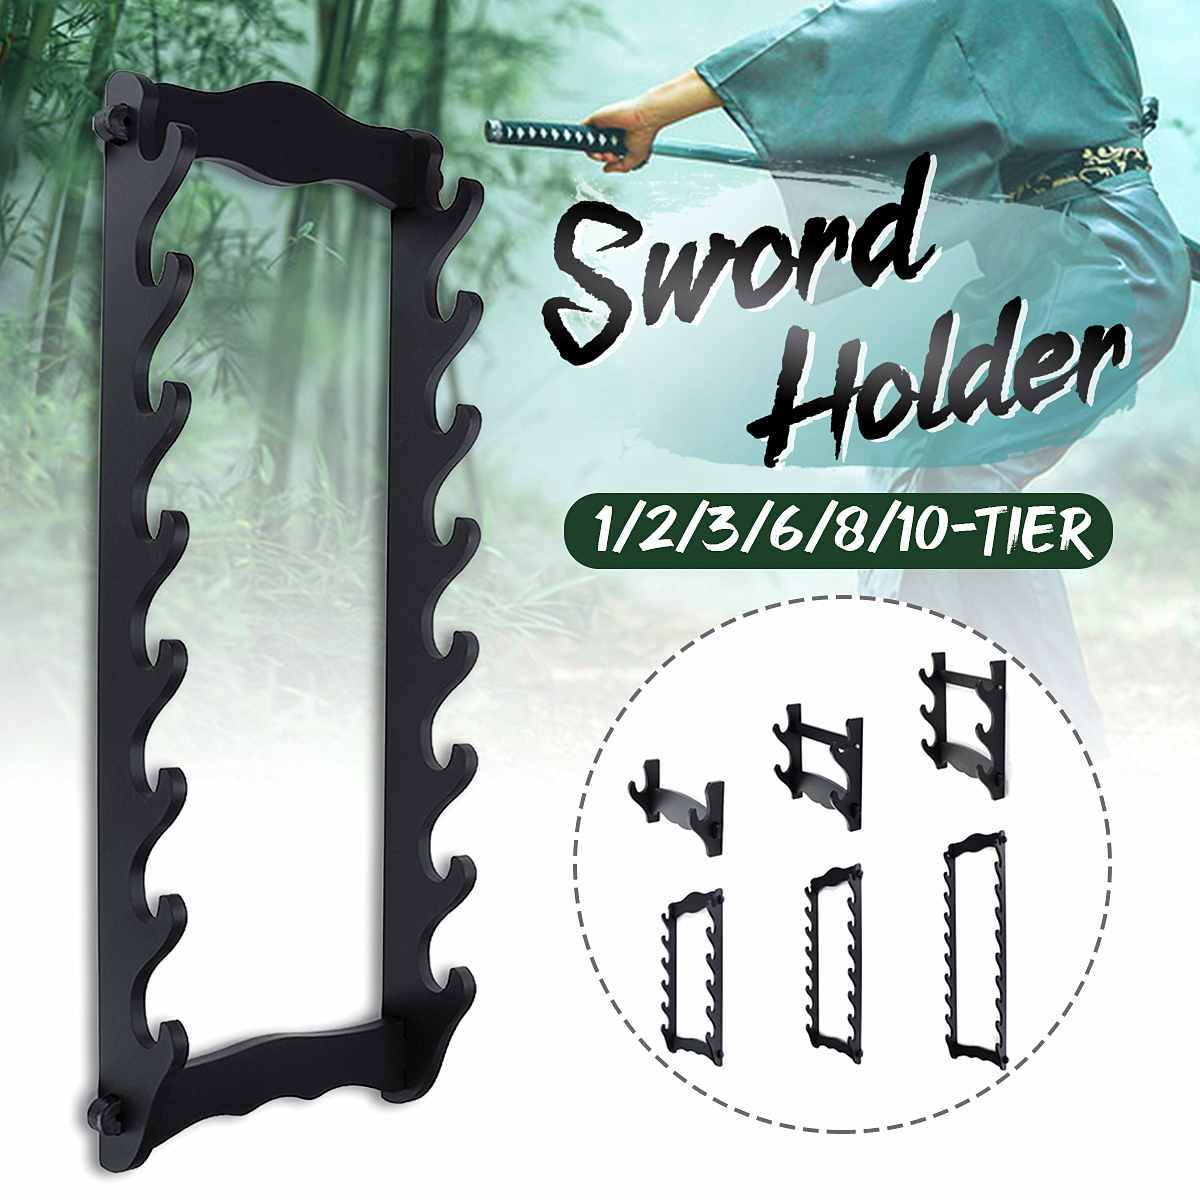 Wooden Bushido 8 Tier Sword Wall Display Stand Japanese Katana Holder